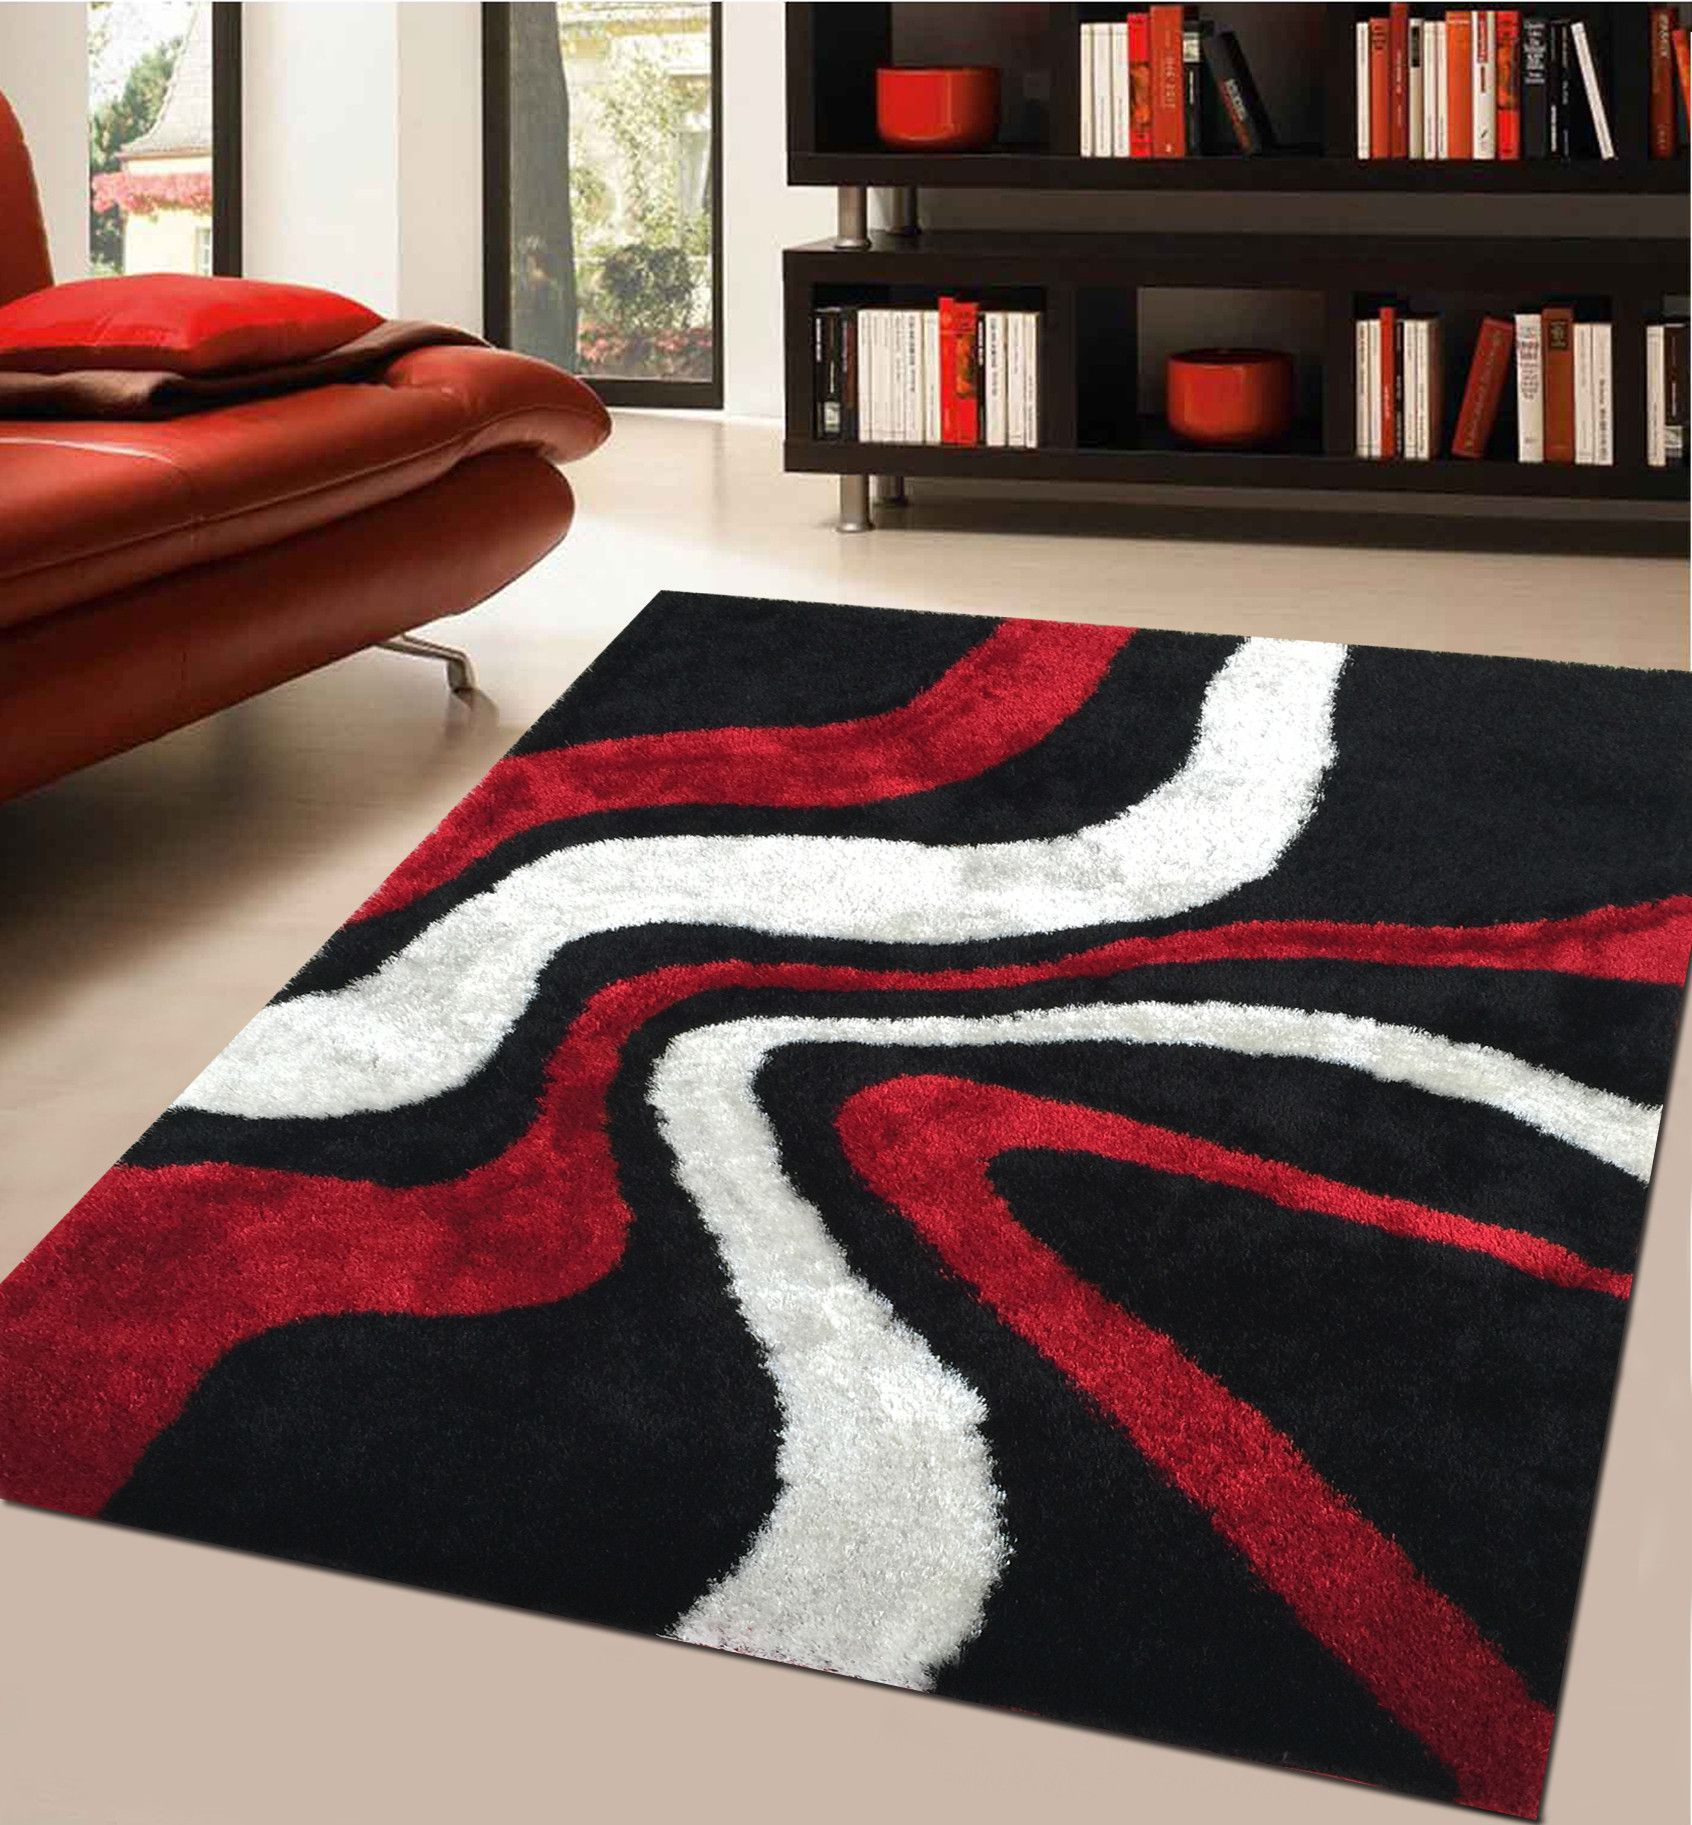 Soft Indoor Bedroom Shag Area Rug In Red Cherie Black Living Room Shag Area Rug Room Rugs